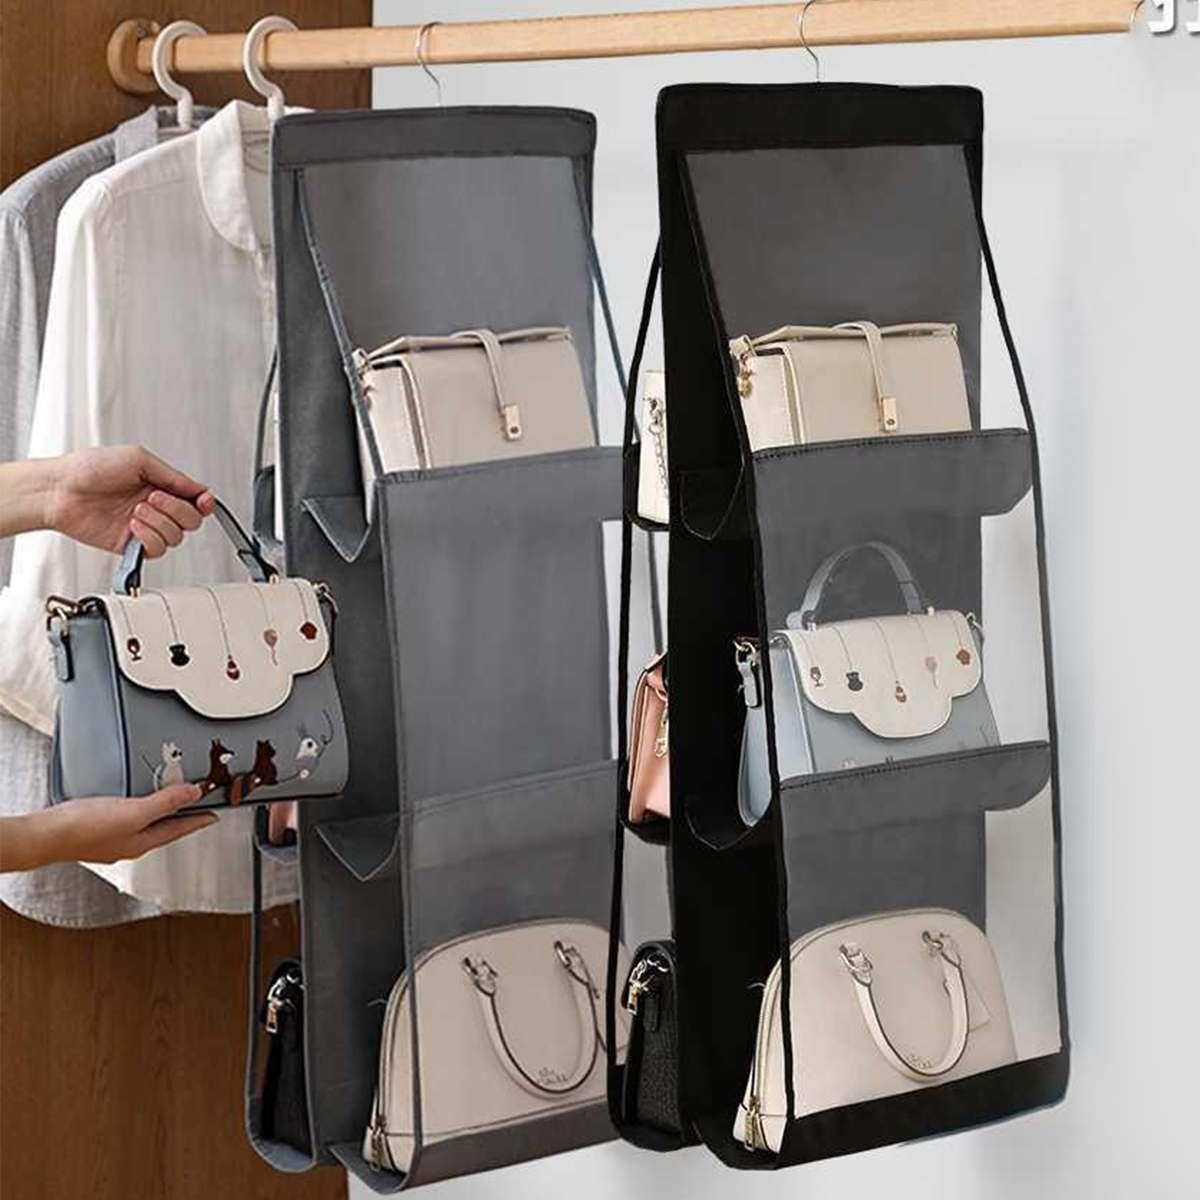 Double-sided Six-layer Hanging Handbag Organizer Shelf Bag Storage Holder Closet Wardrobe Bag Organizer Hanger